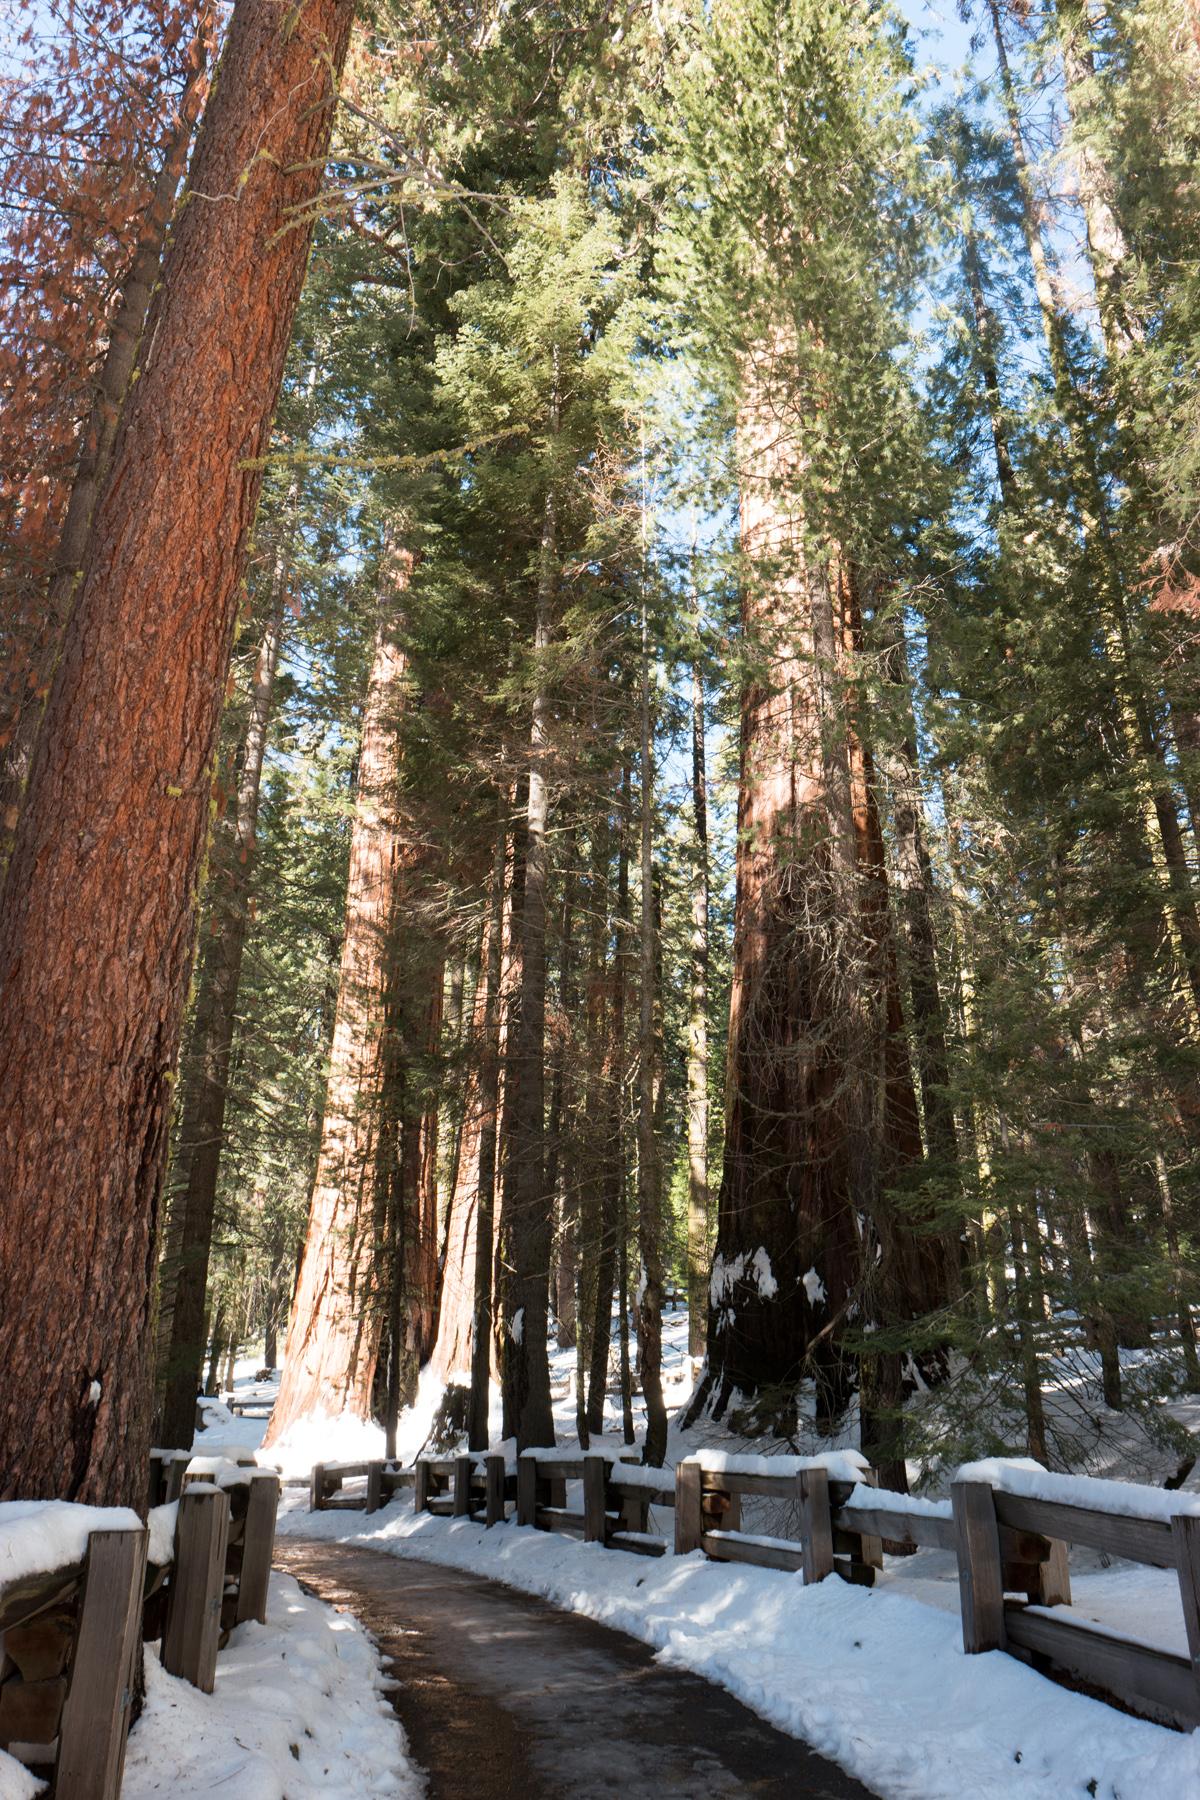 Wasim Muklashy Photography_Sequoia National Park_California_December 2015_-SAM_4585.jpg